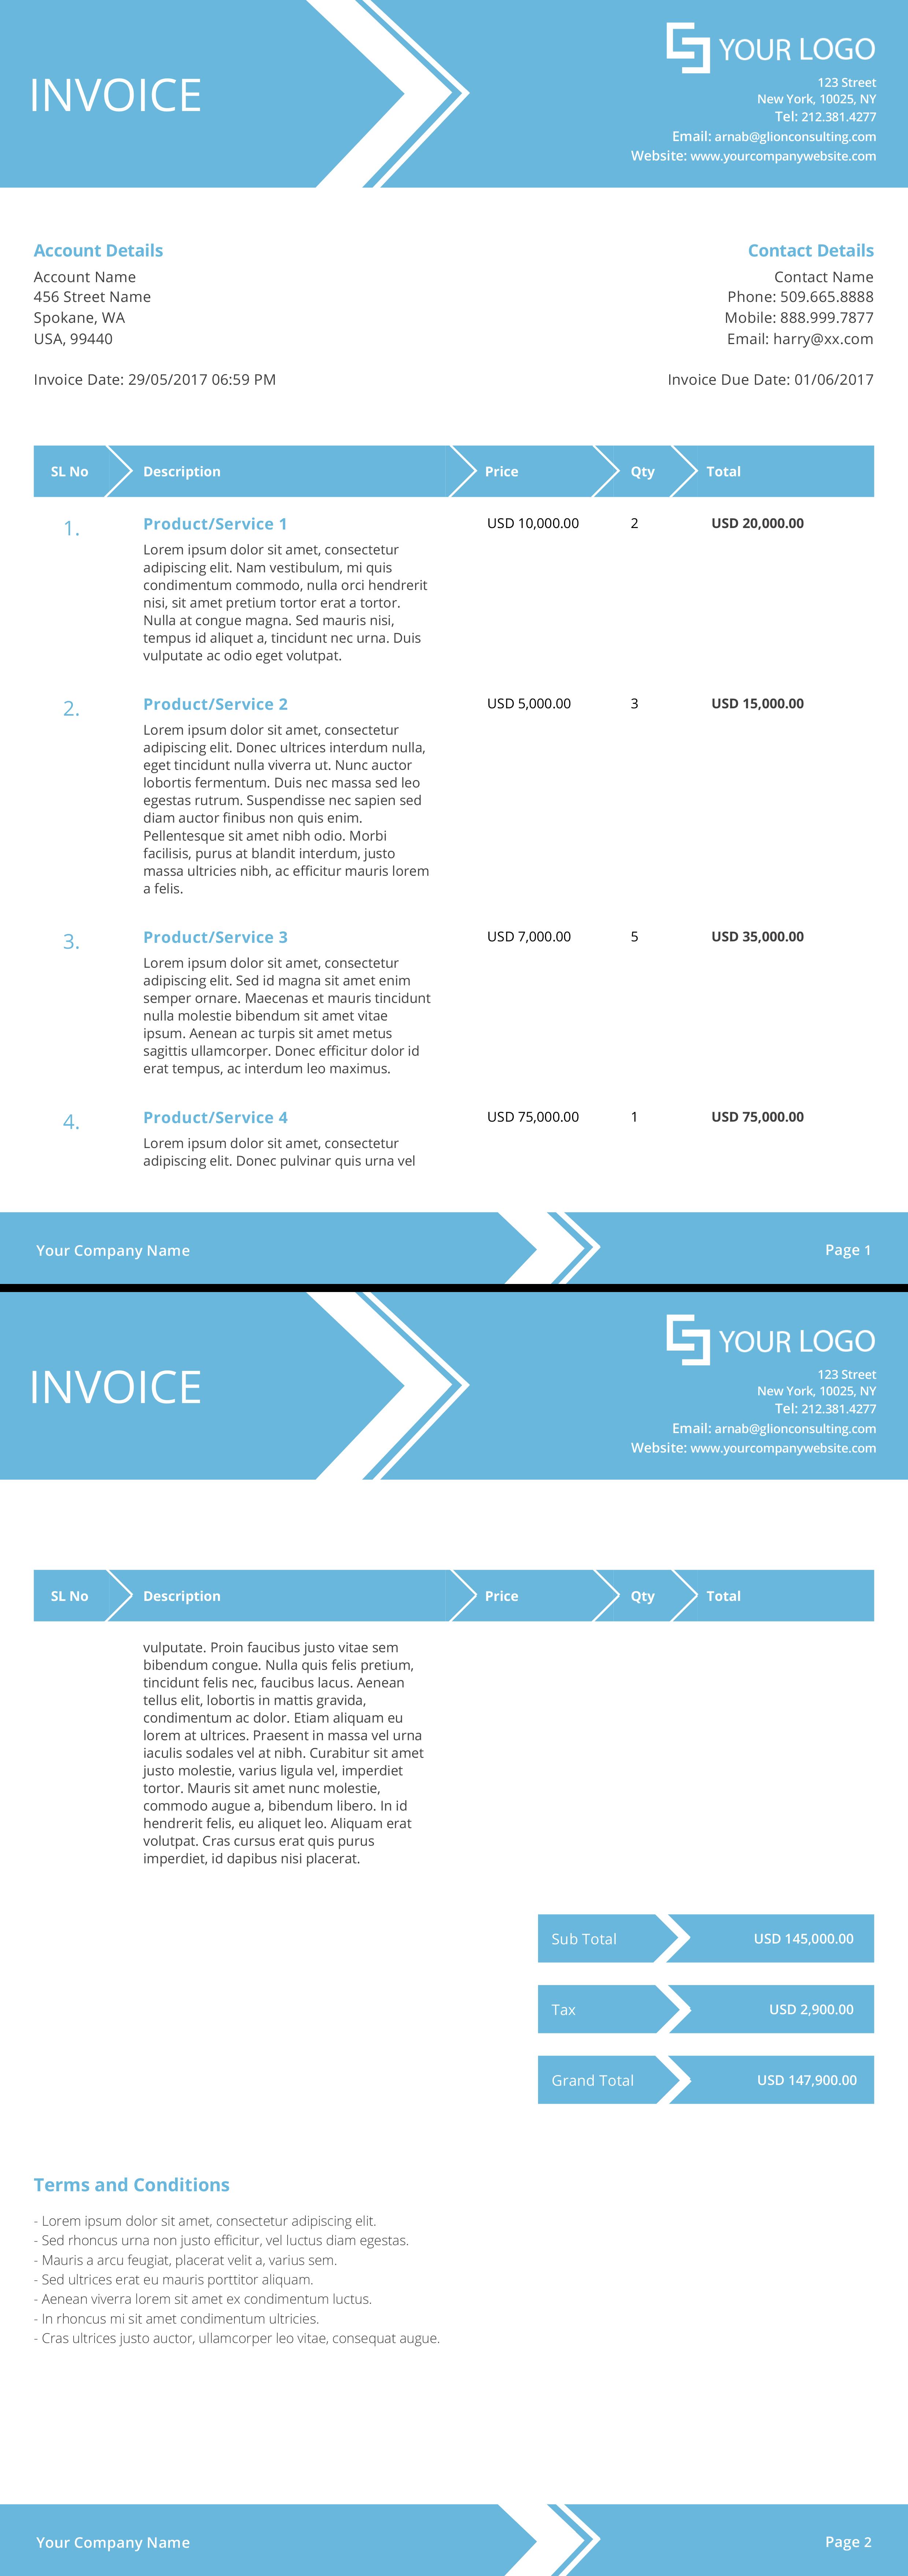 INV-DEER-BLUE-69B7DC-8.png